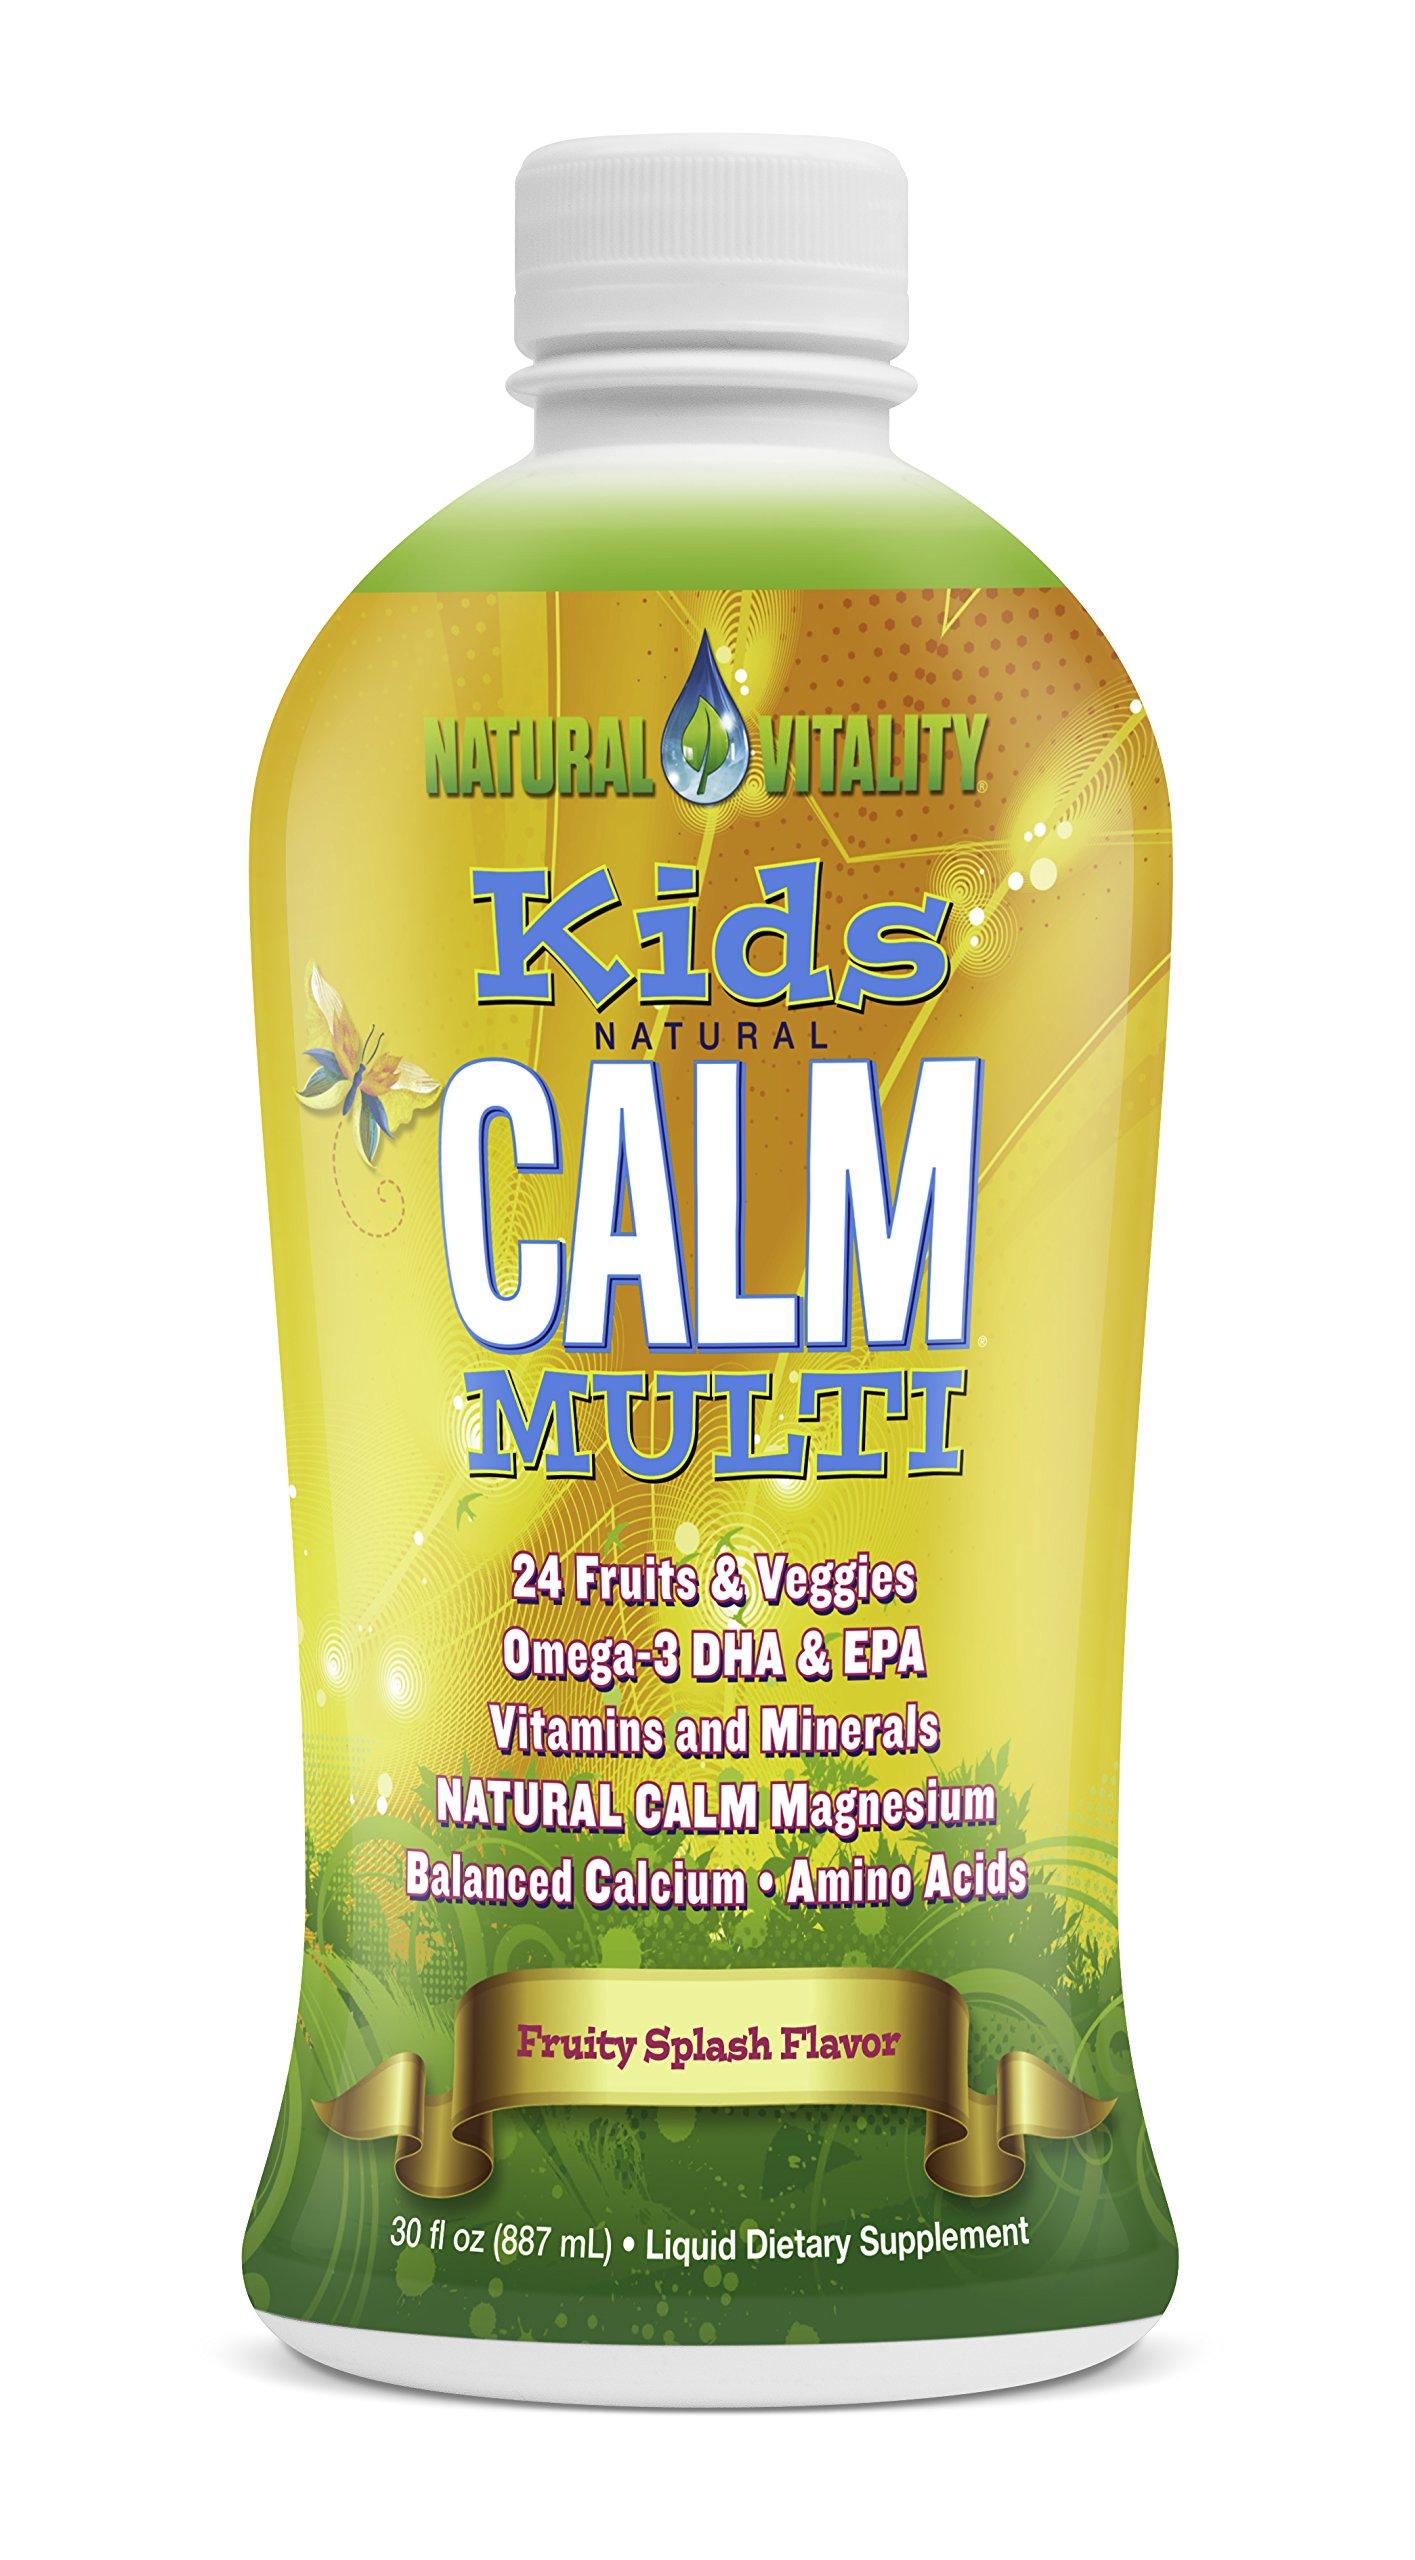 Natural Vitality Kids Calm Multi (Organic Fruity Splash Flavor, 30oz)